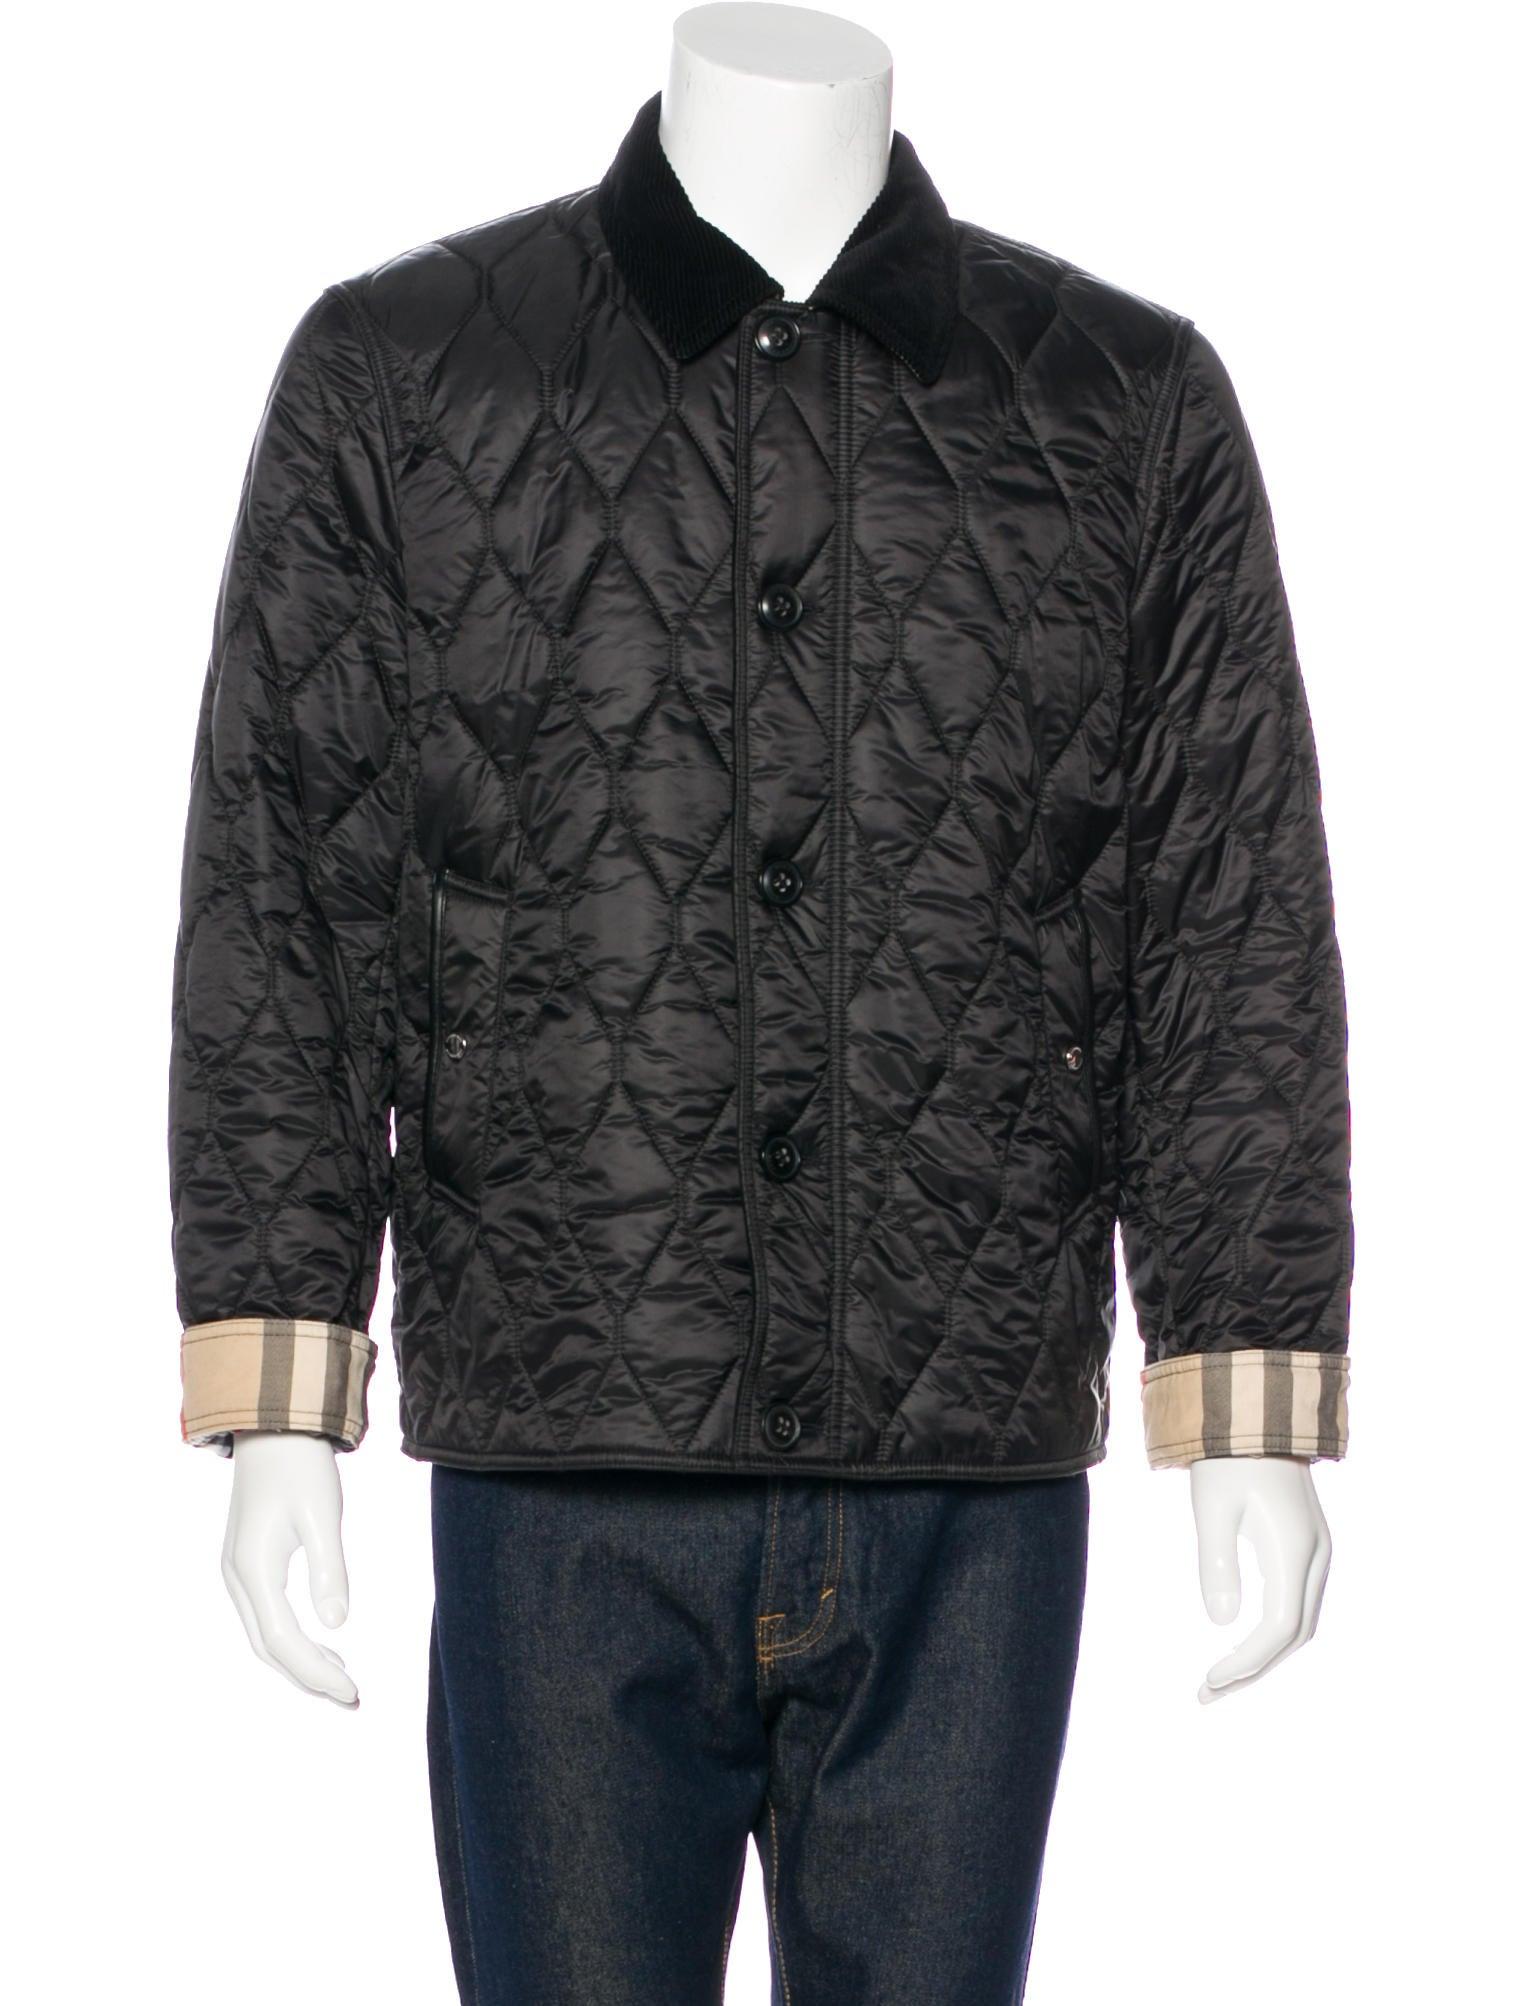 fur jacket bomber quilt designers quilted jackets en men coats harrods burberry com mens clothing gb lined